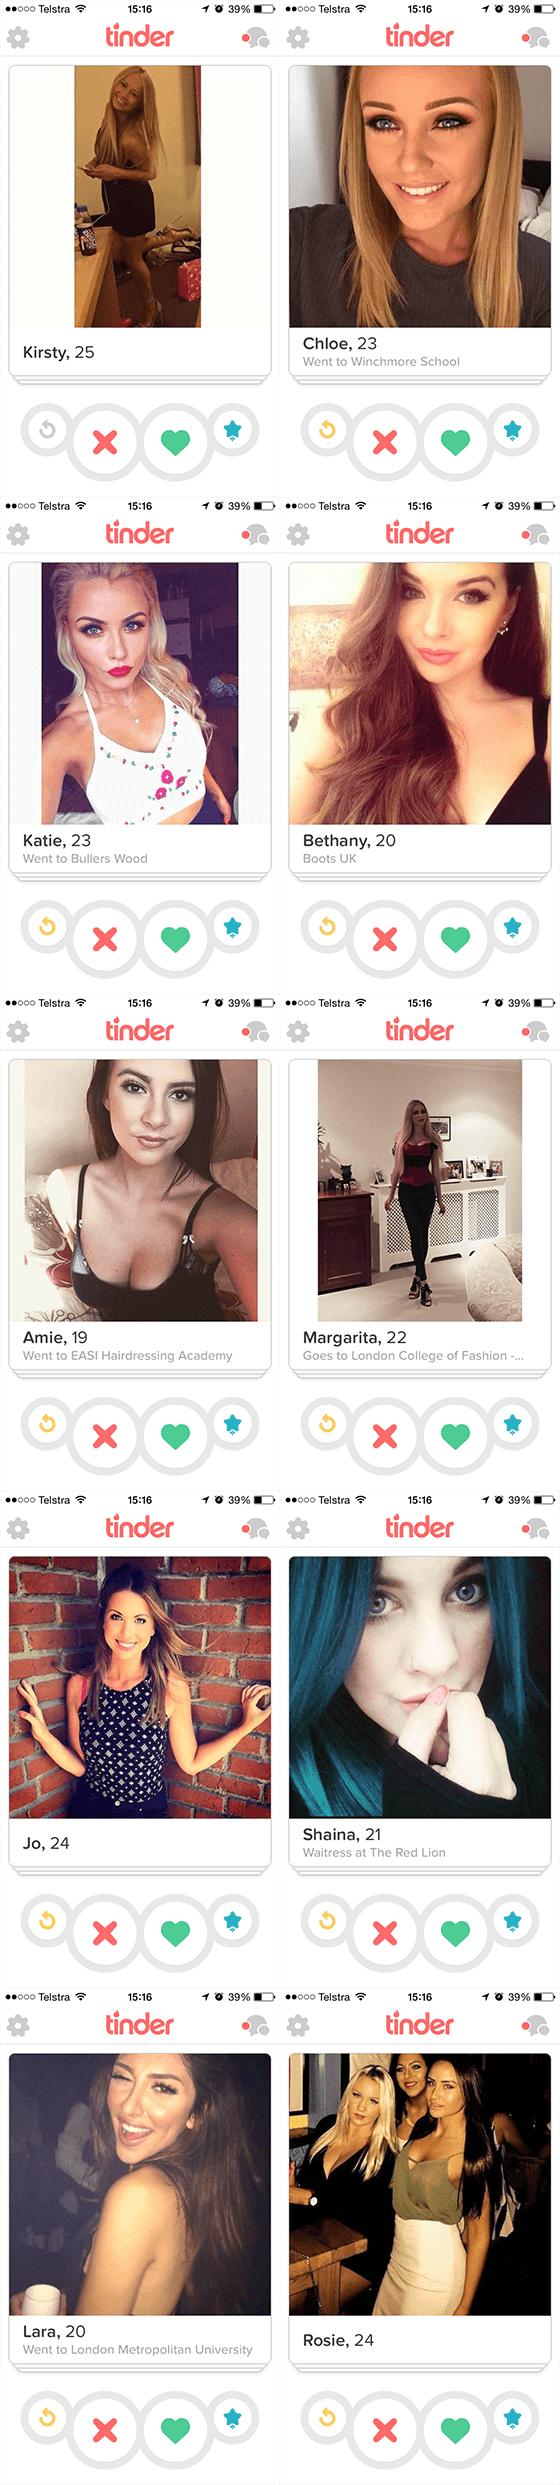 Hottest-Popular-Tinder-girls-in-London-England